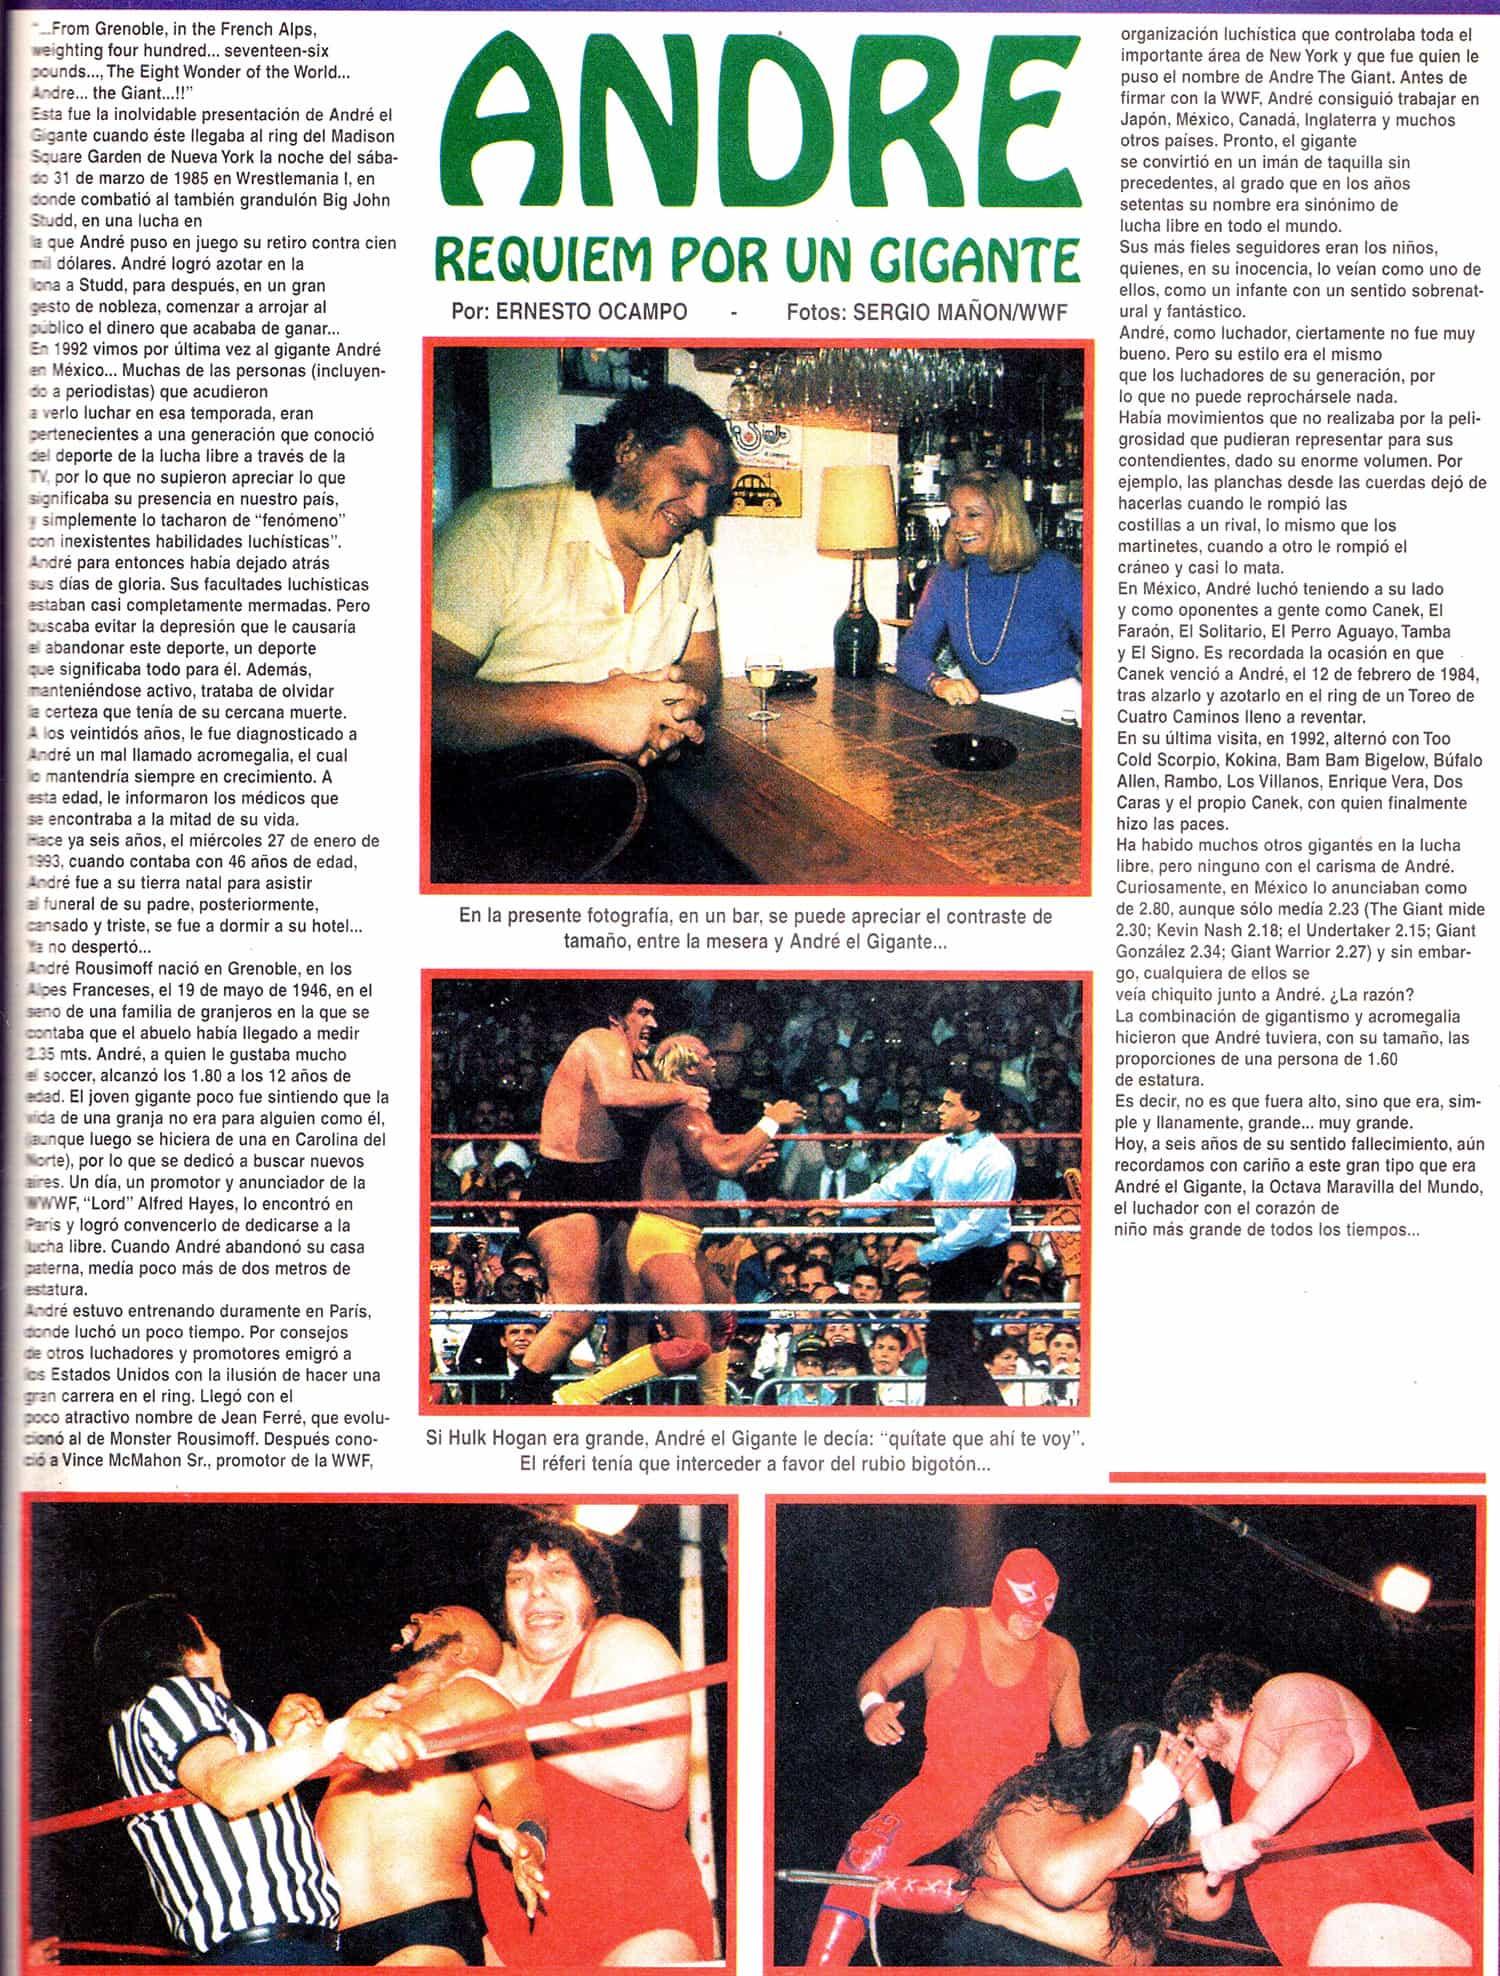 Andre el Gigante Super Luchas 410